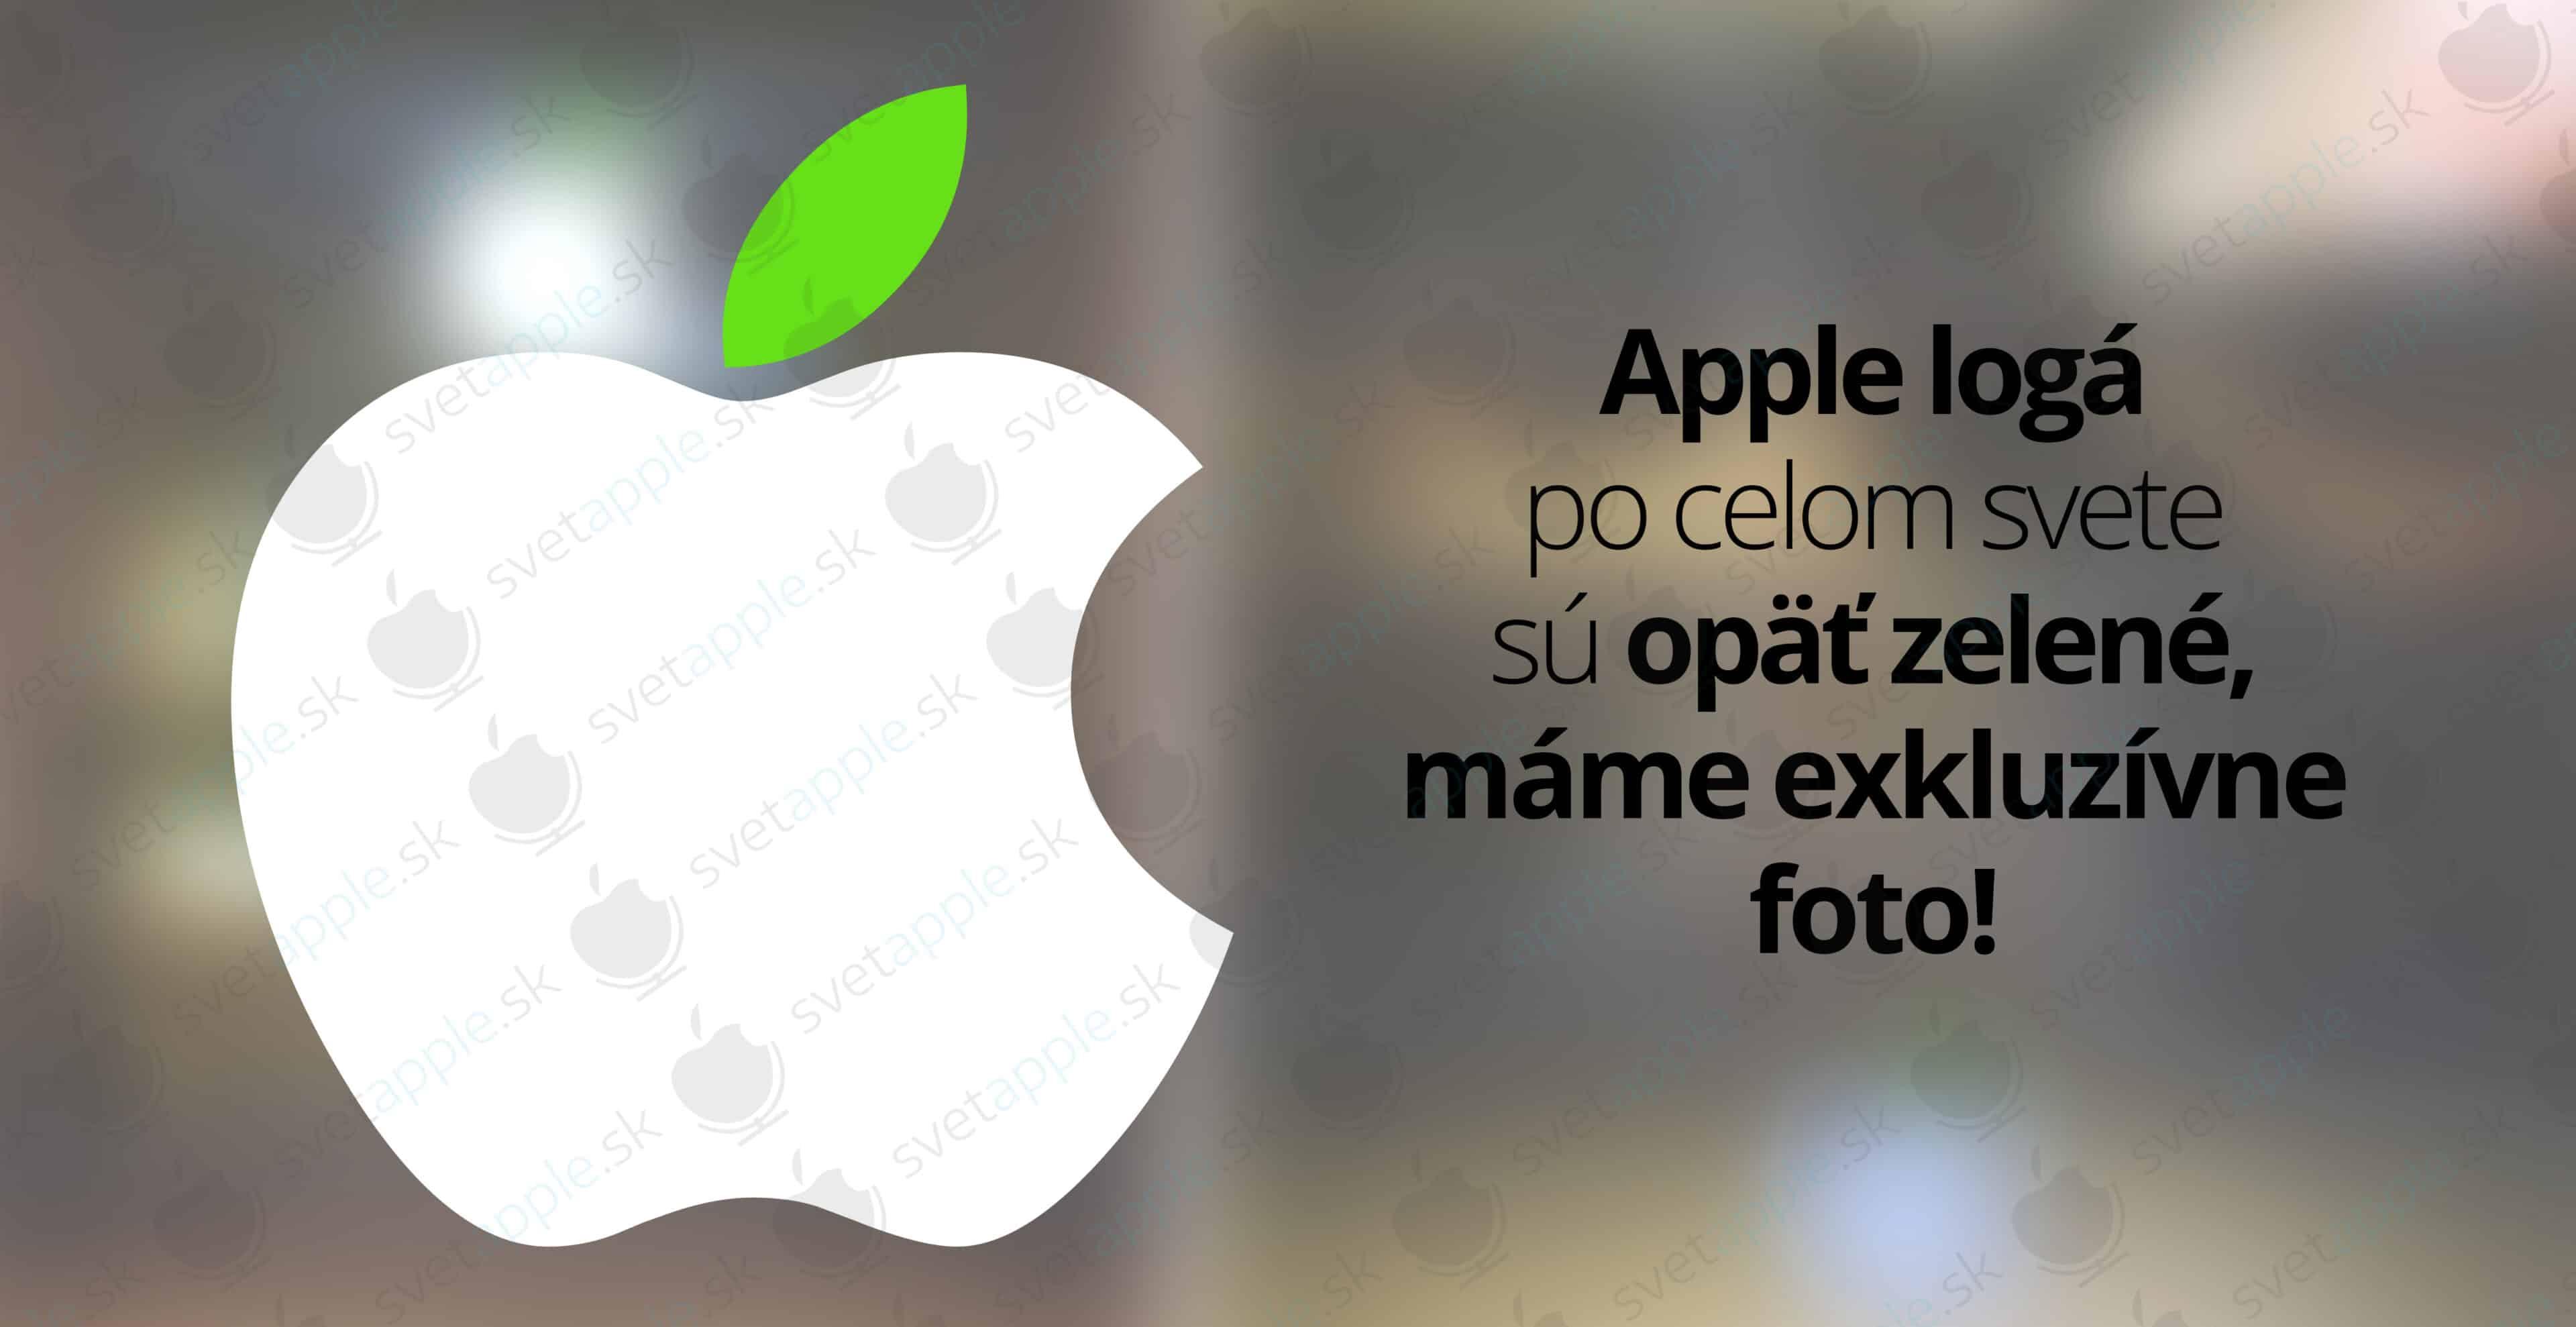 zelene-logo-apple---titulná-fotografia---SvetApple